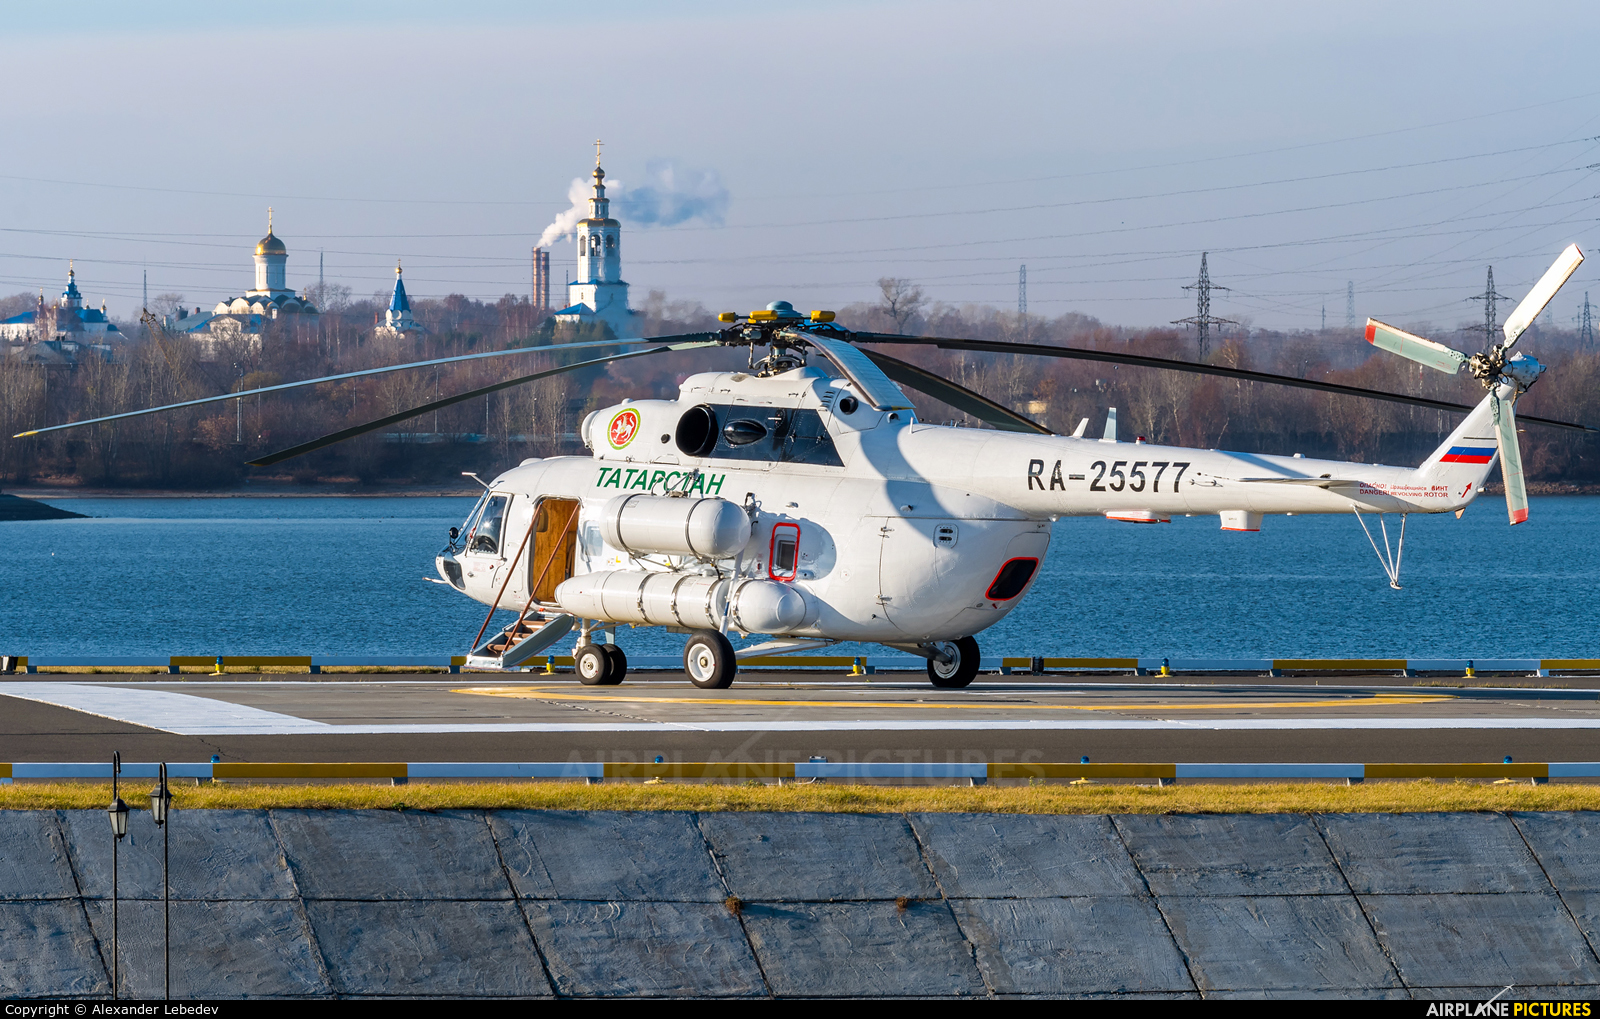 Tatarstan - Government RA-25577 aircraft at Off Airport - Russia